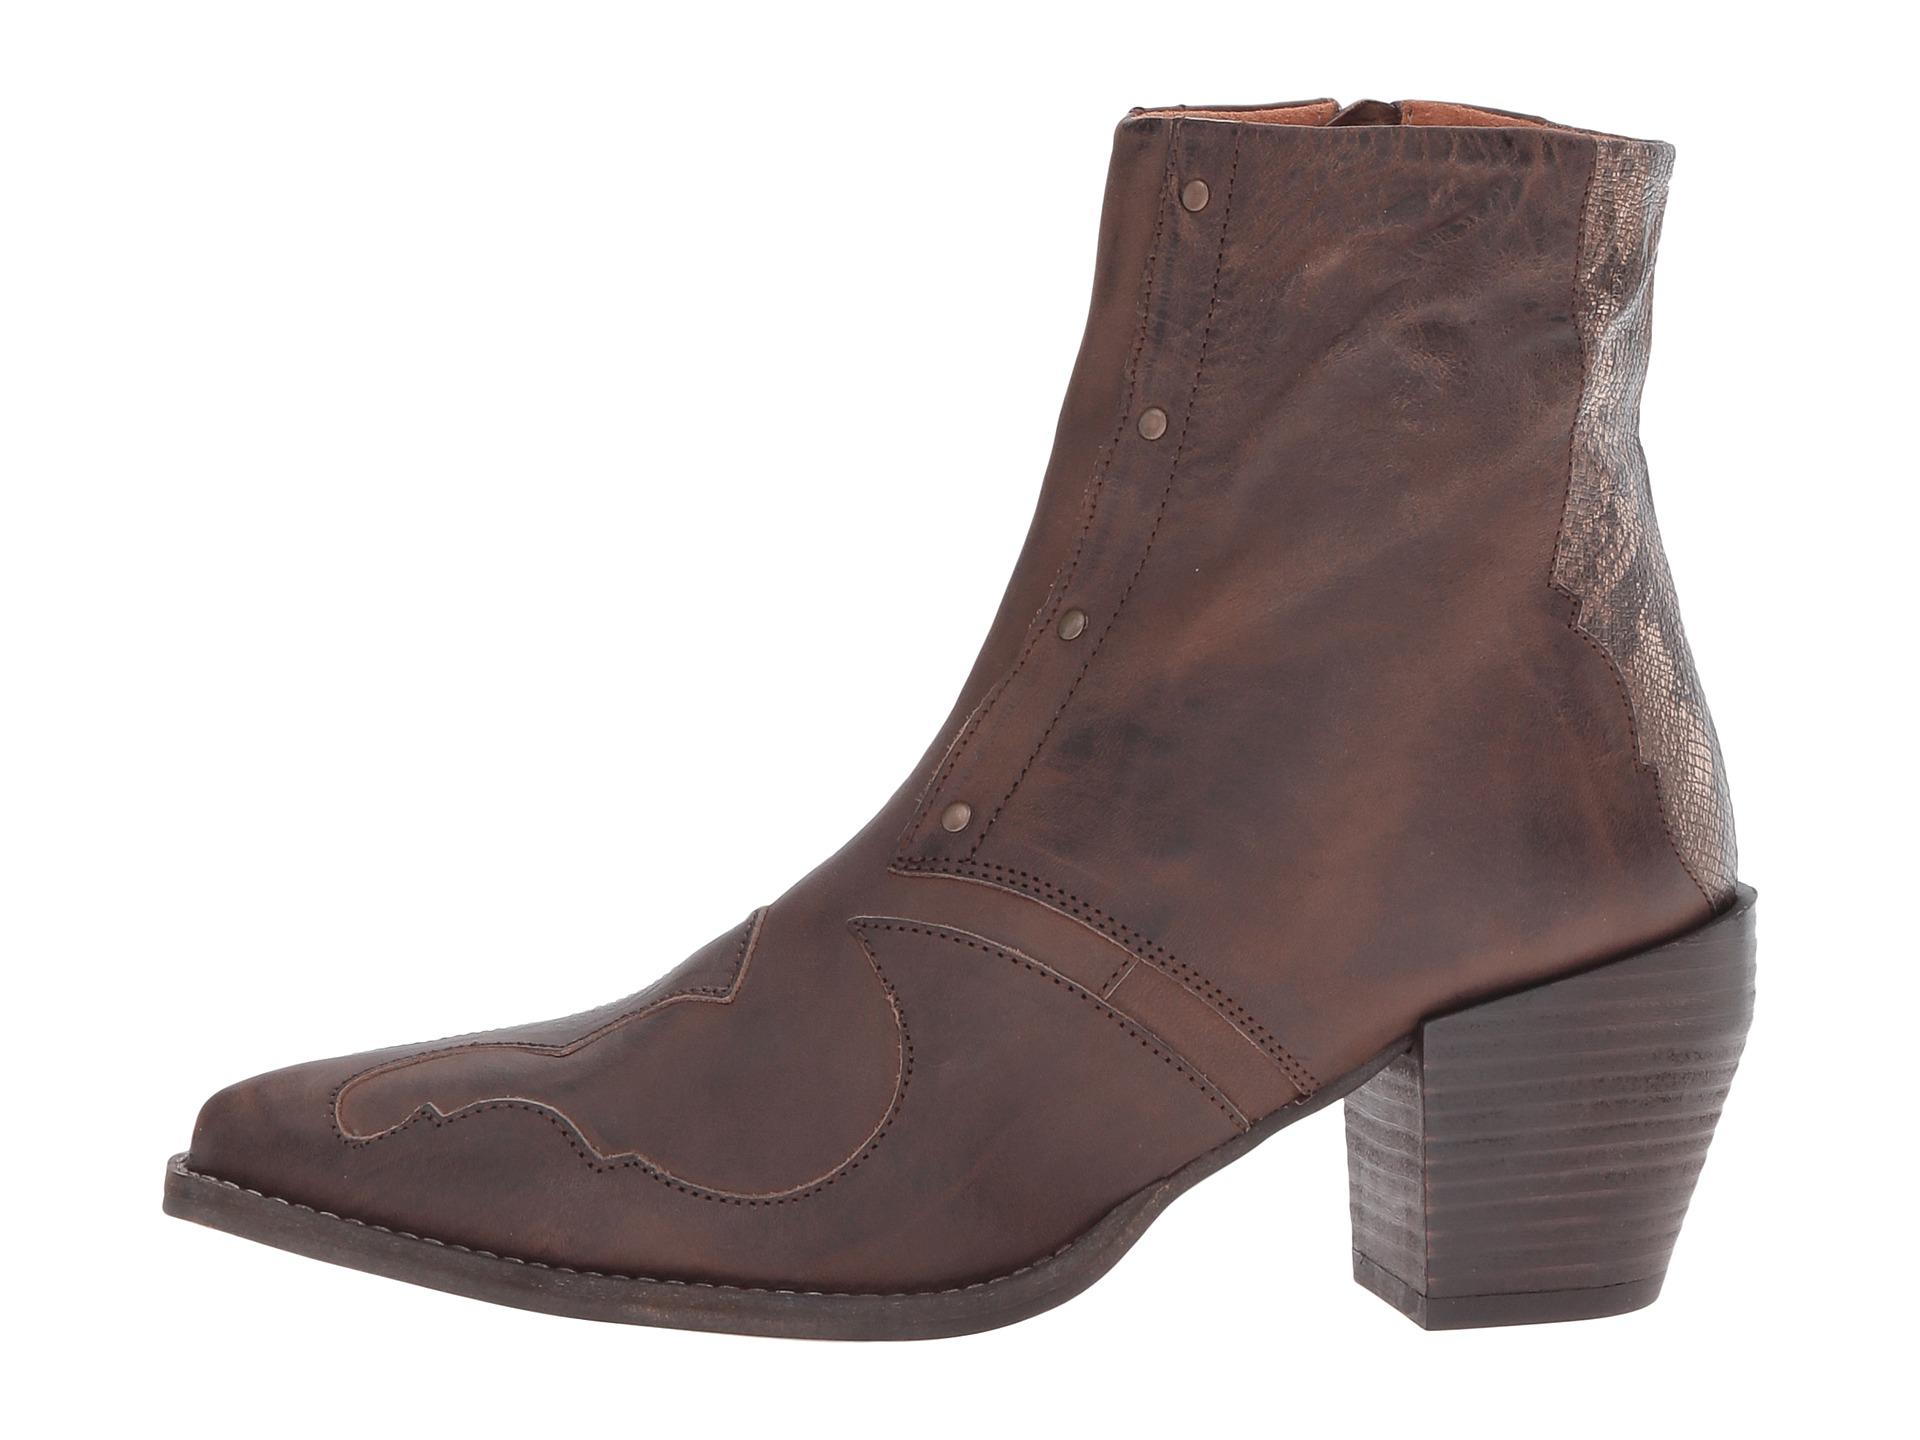 free nevada thunder boot brown zappos free